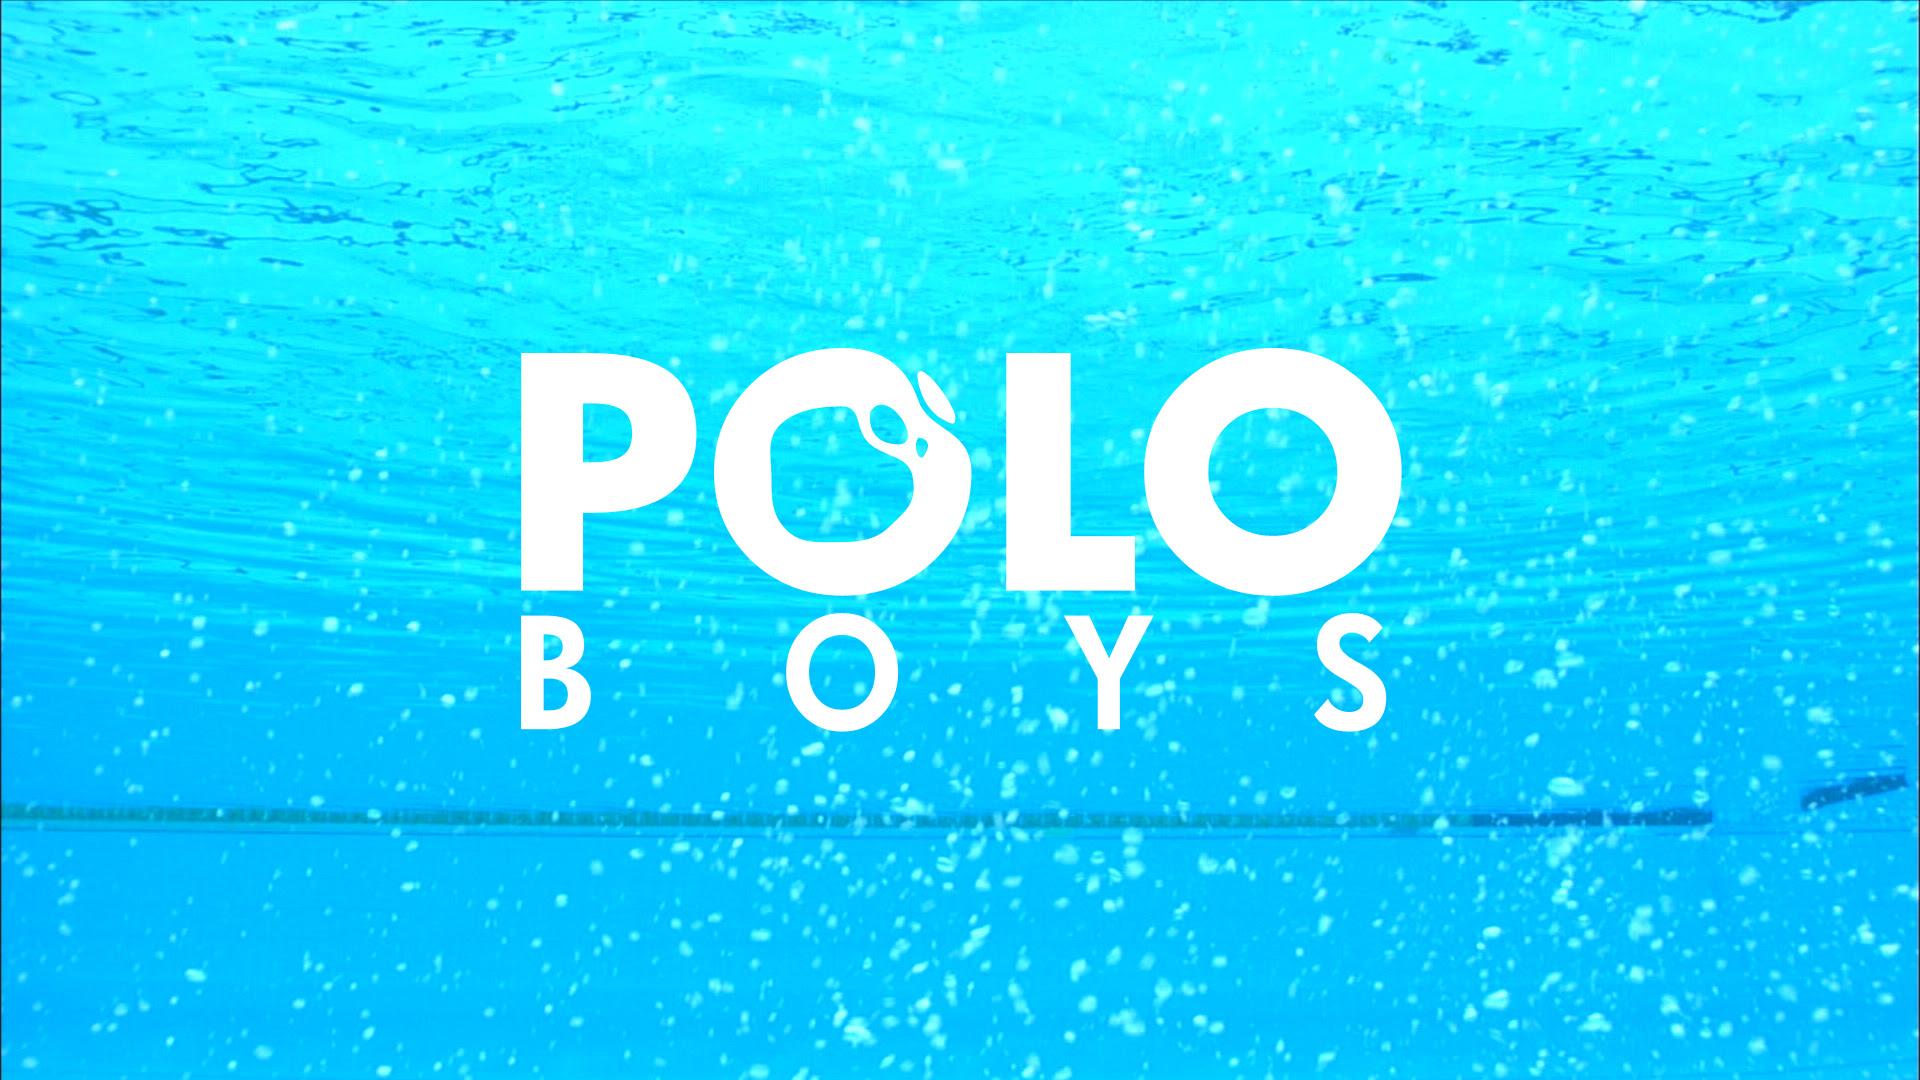 Download 400+ Wallpaper Hd Polos  Terbaik